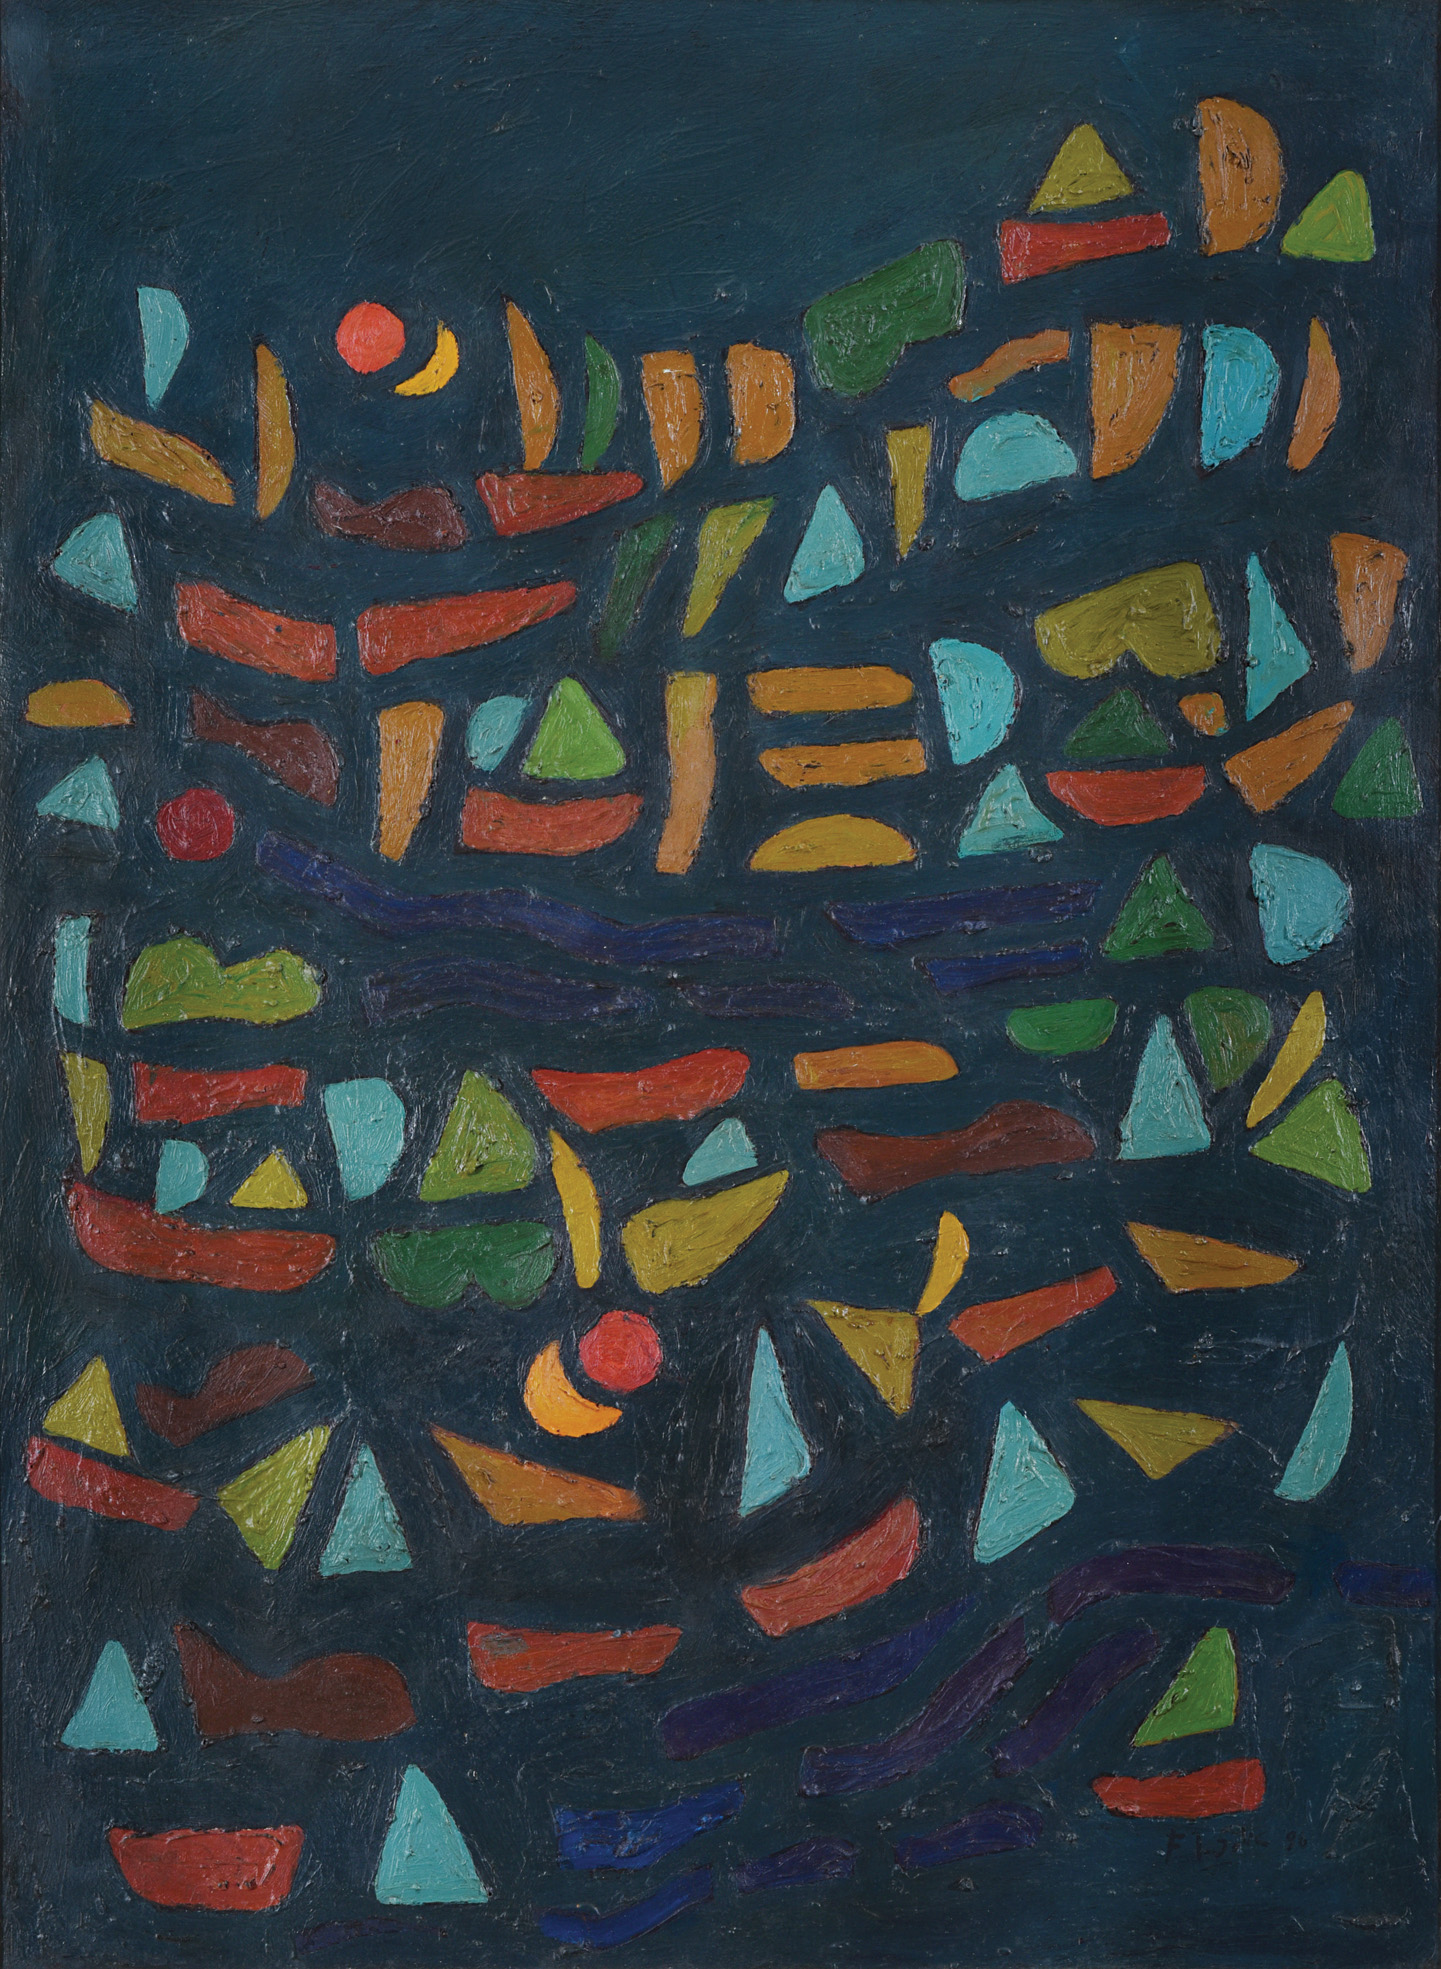 Fadjar Sidik, Bentuk Bertumpuk dengan Dua Matahari (Stacked Forms with Two Suns), oil on canvas, 90 x 65 cm, 1996